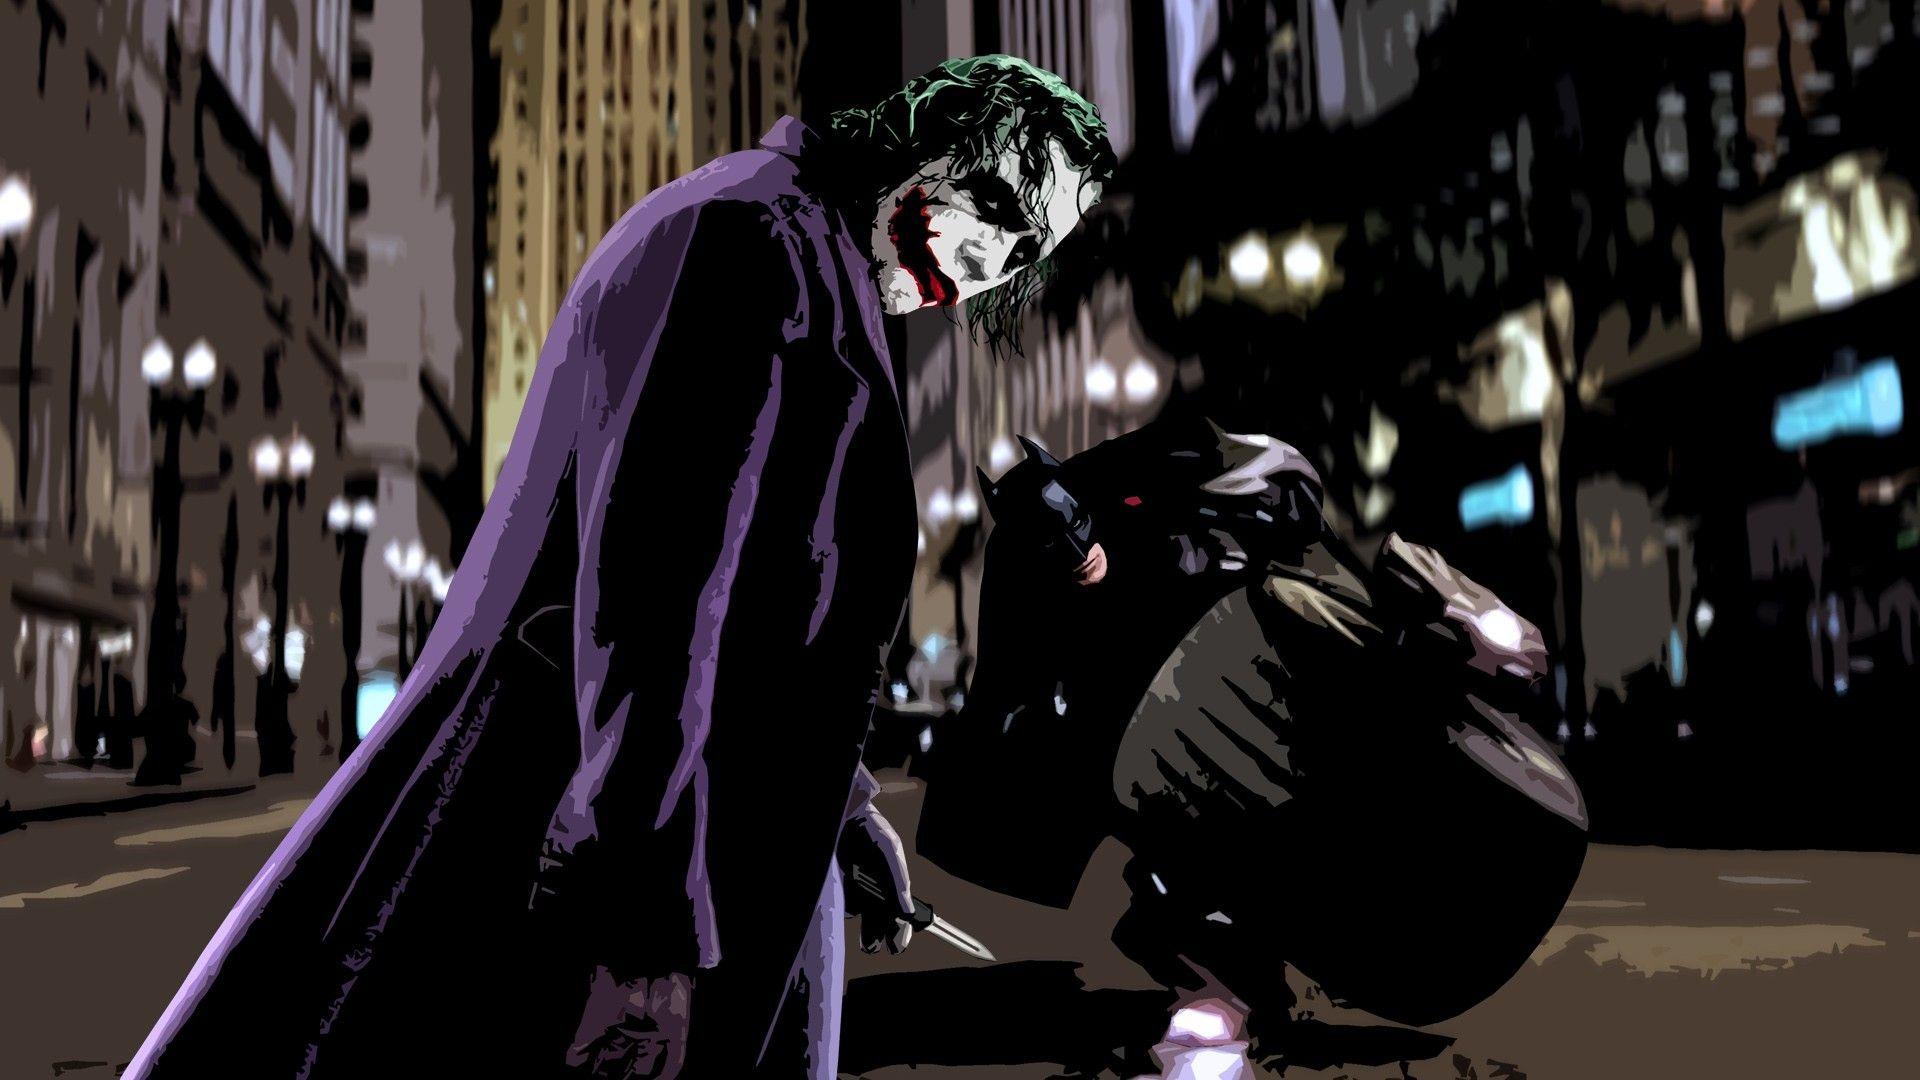 Batman And Joker Wallpaper For Desktop 9